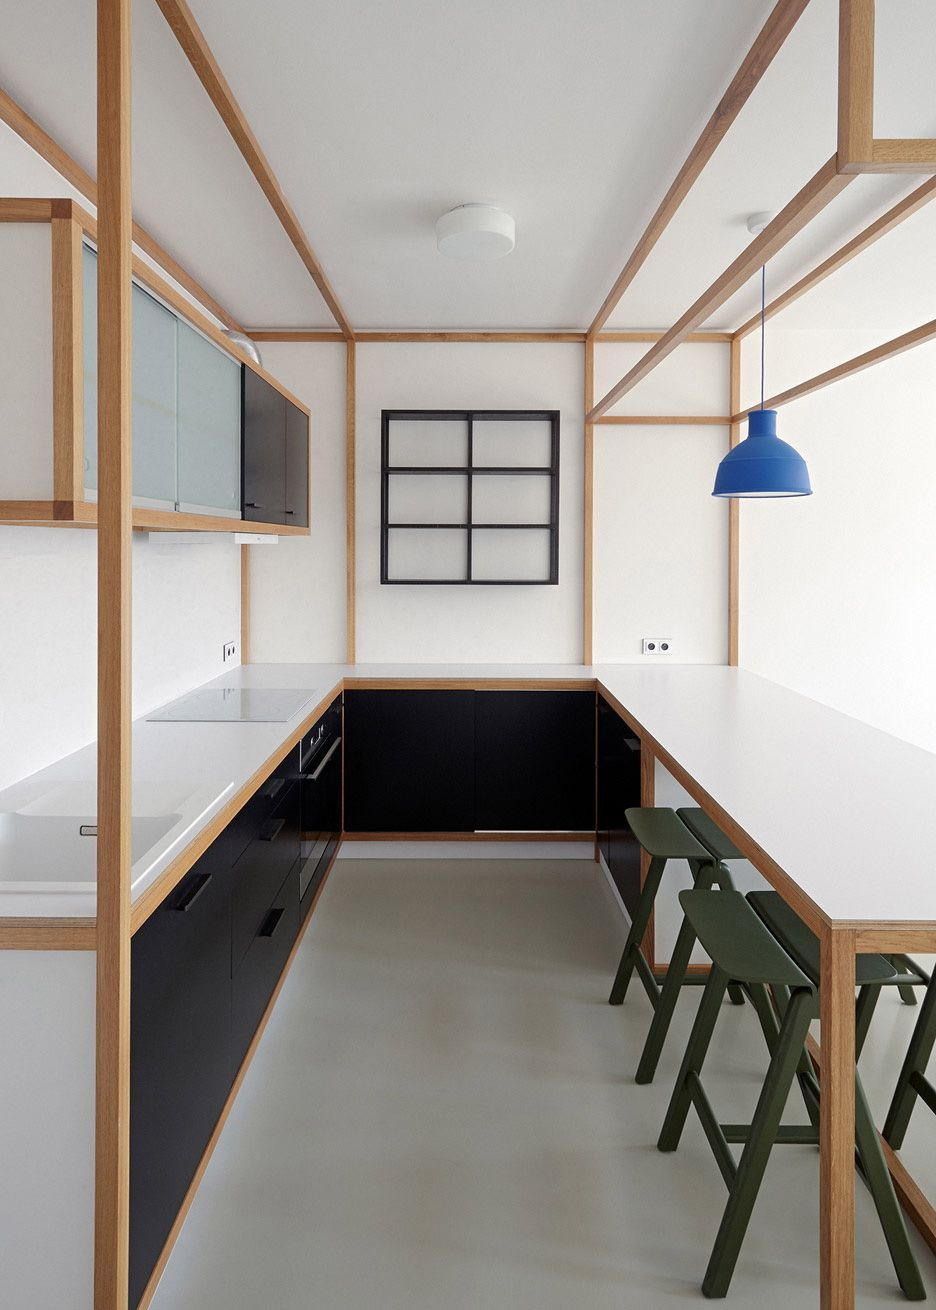 Guest Apartment Dddaann Mjolk Design Interior Prague | Yellowtrace